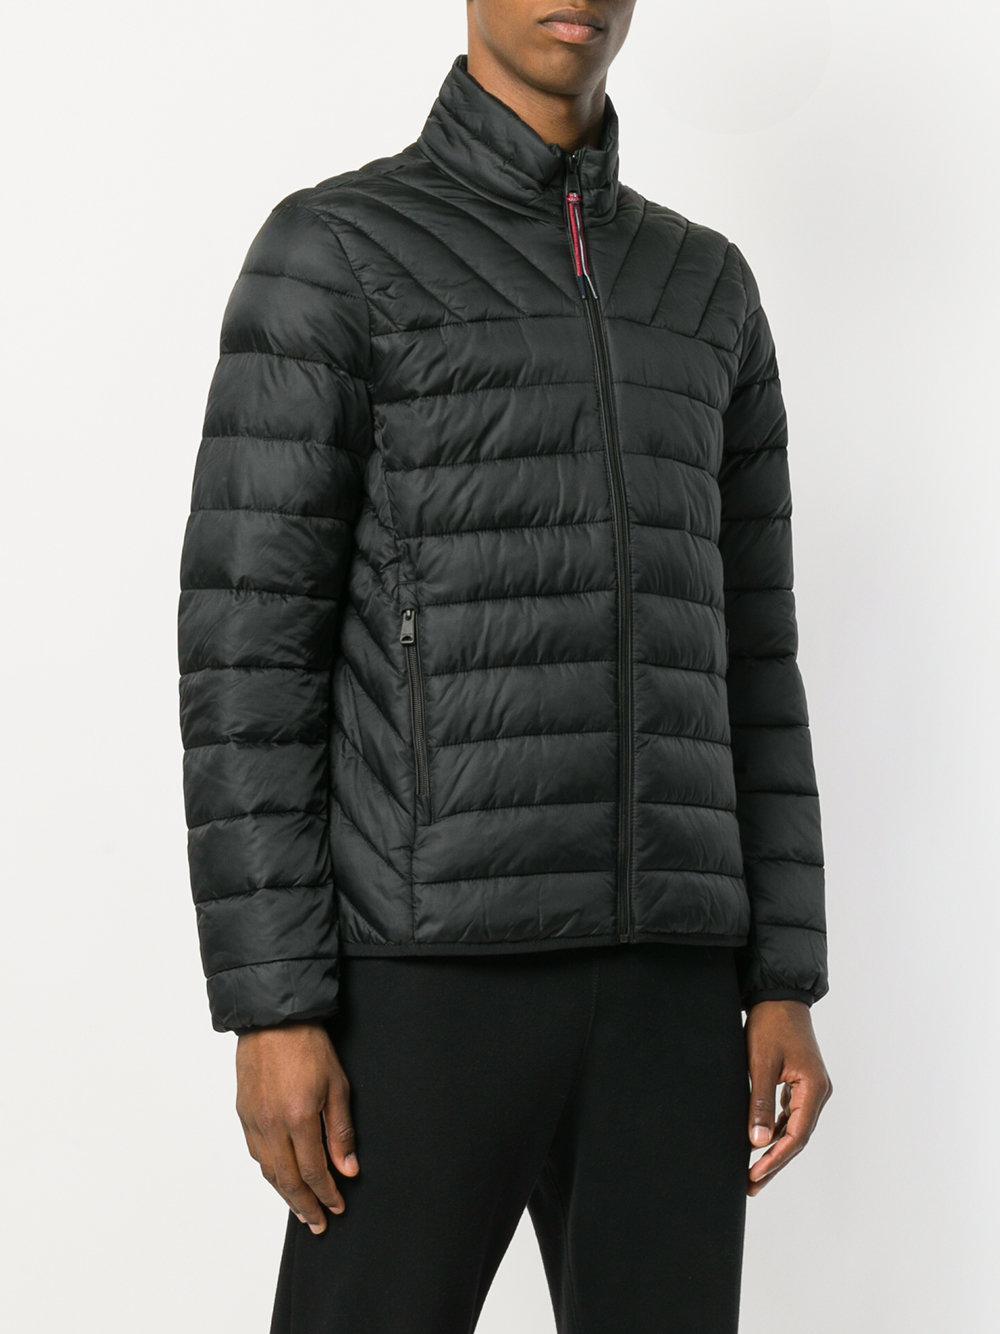 Napapijri Synthetic Padded Band Collar Jacket in Black for Men